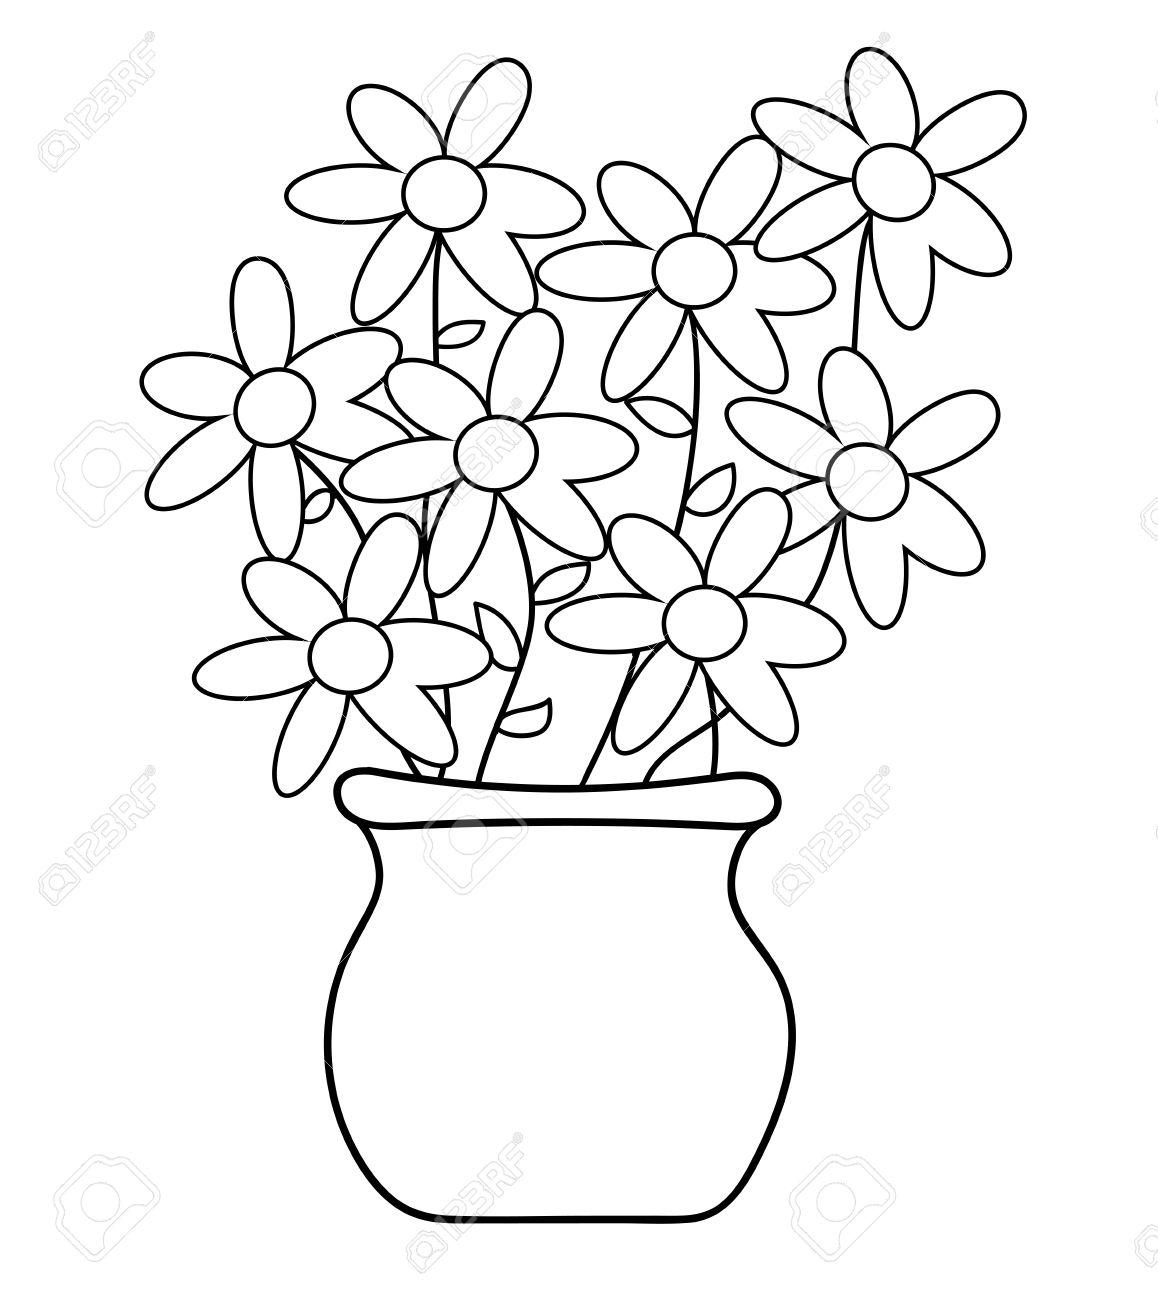 Flower Pot Coloring Page.